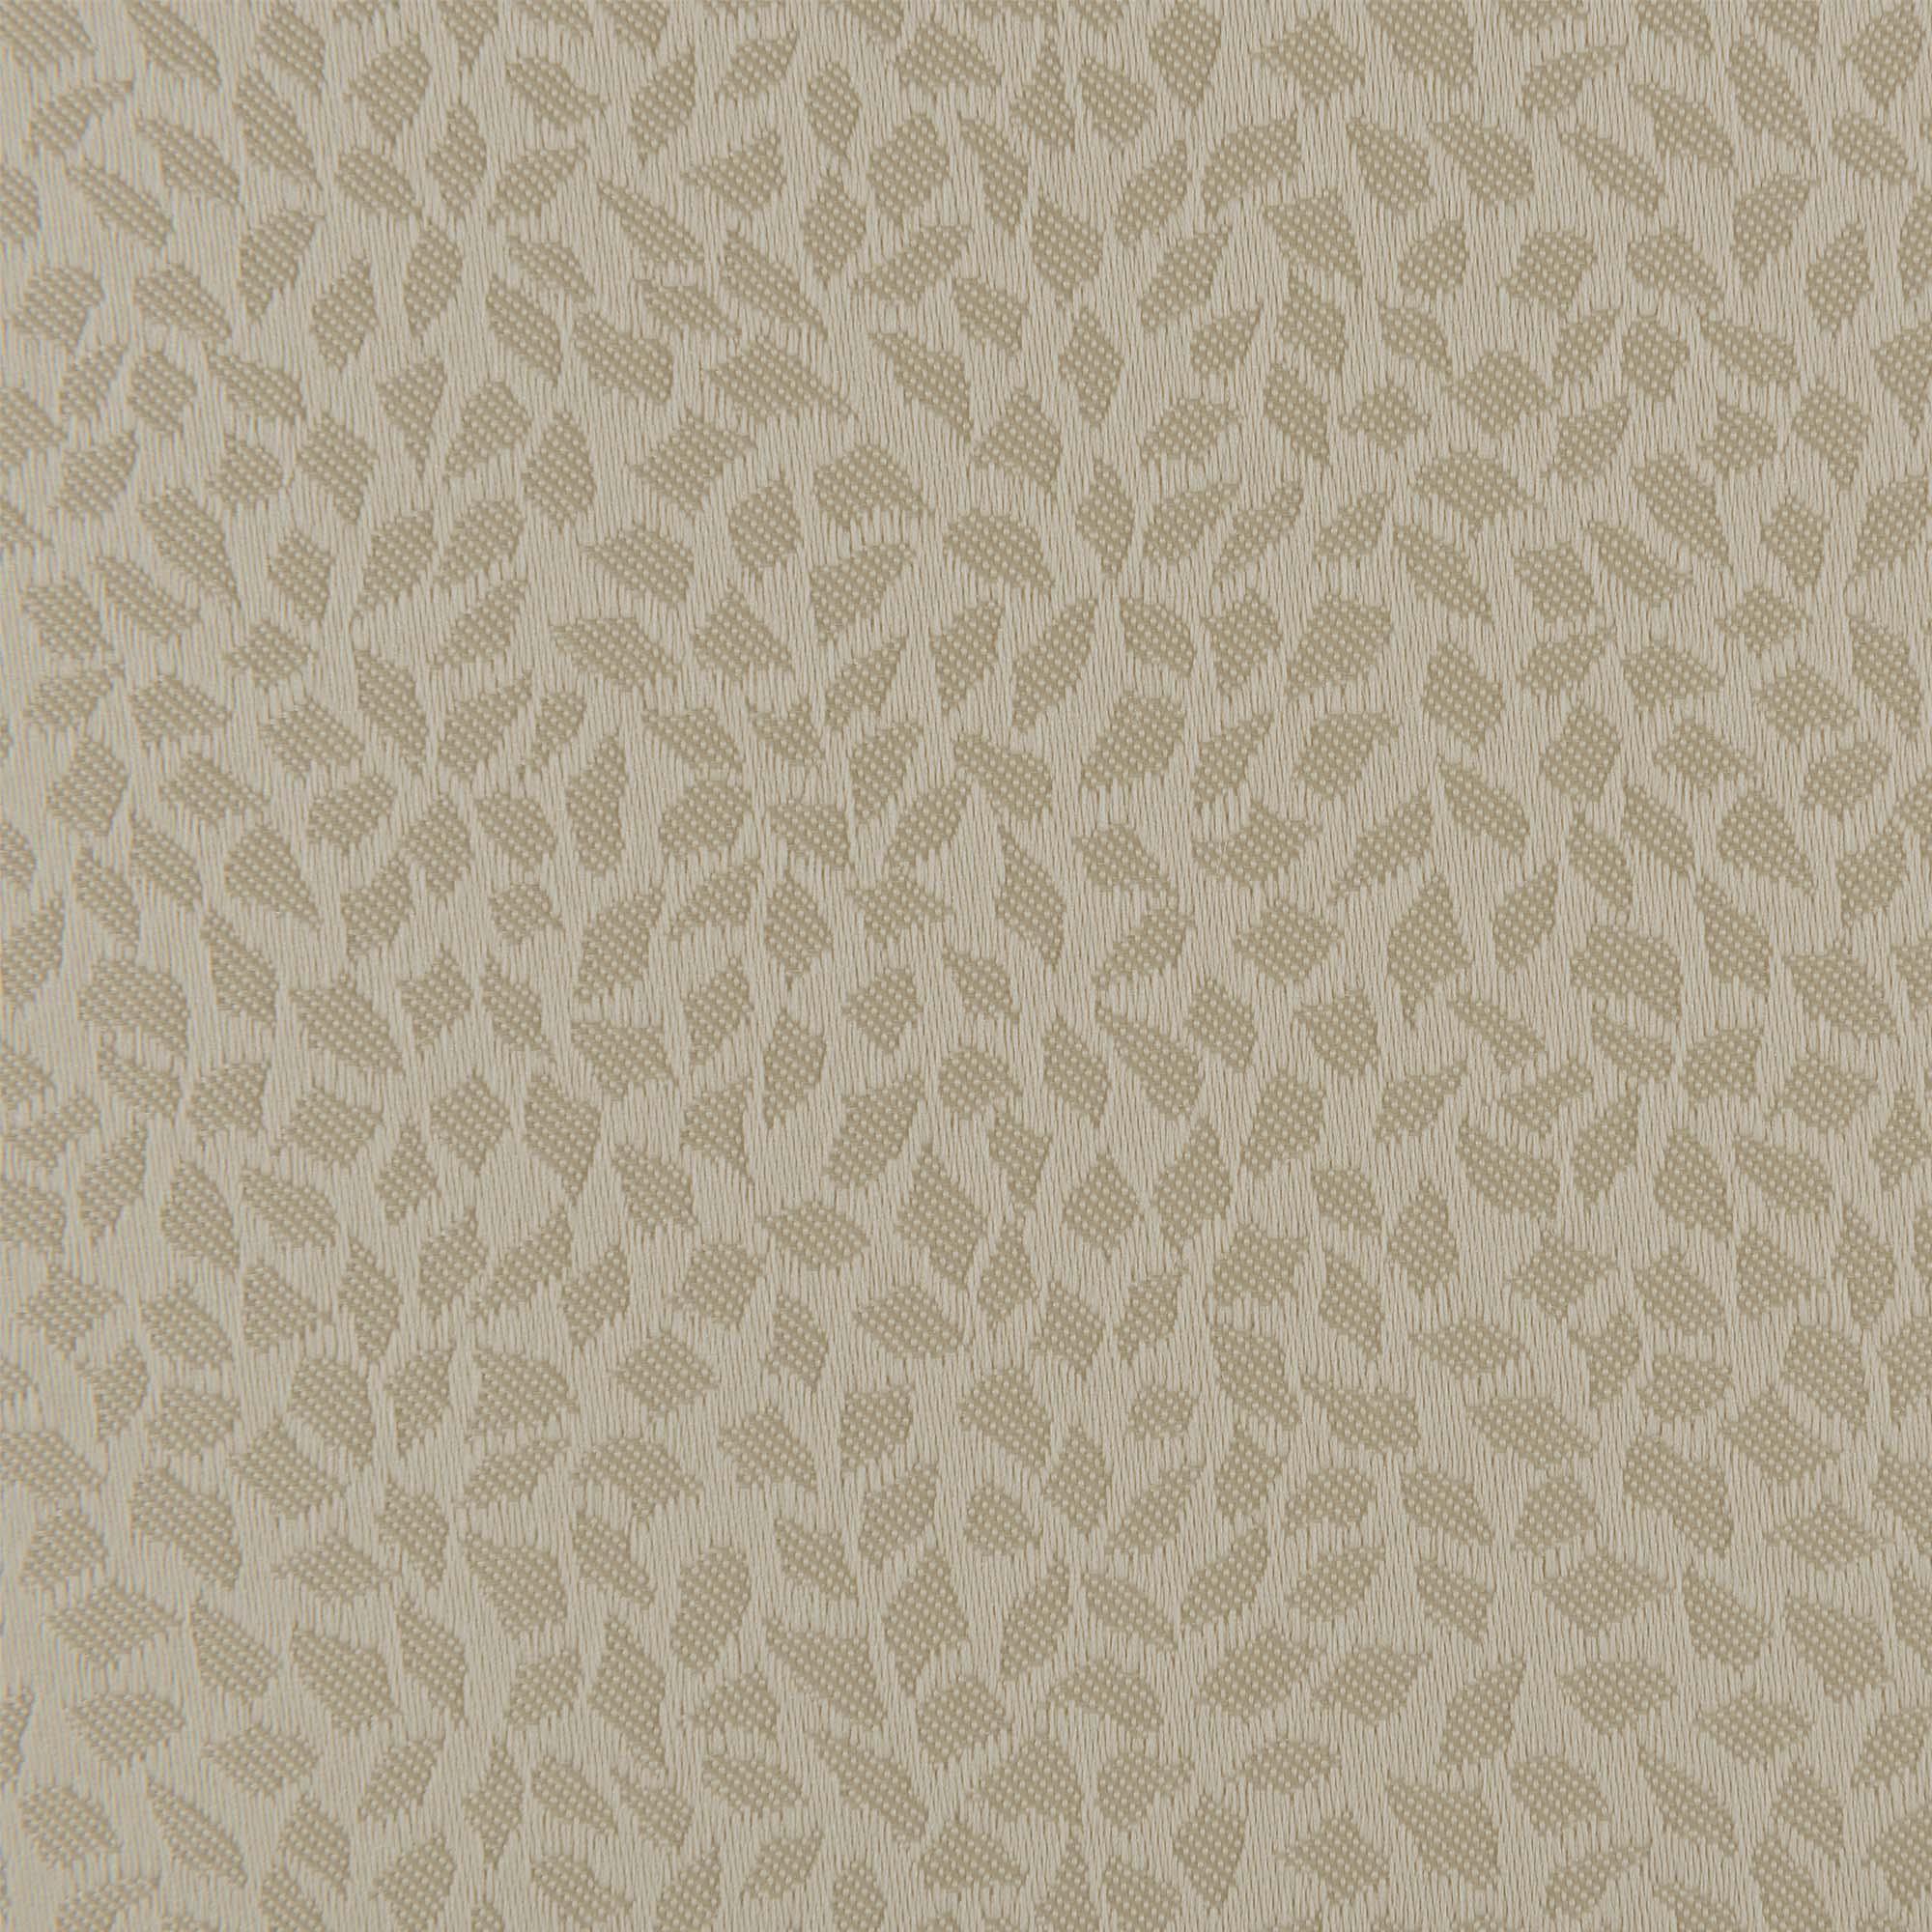 Alessi Porcelain Blind Fabric